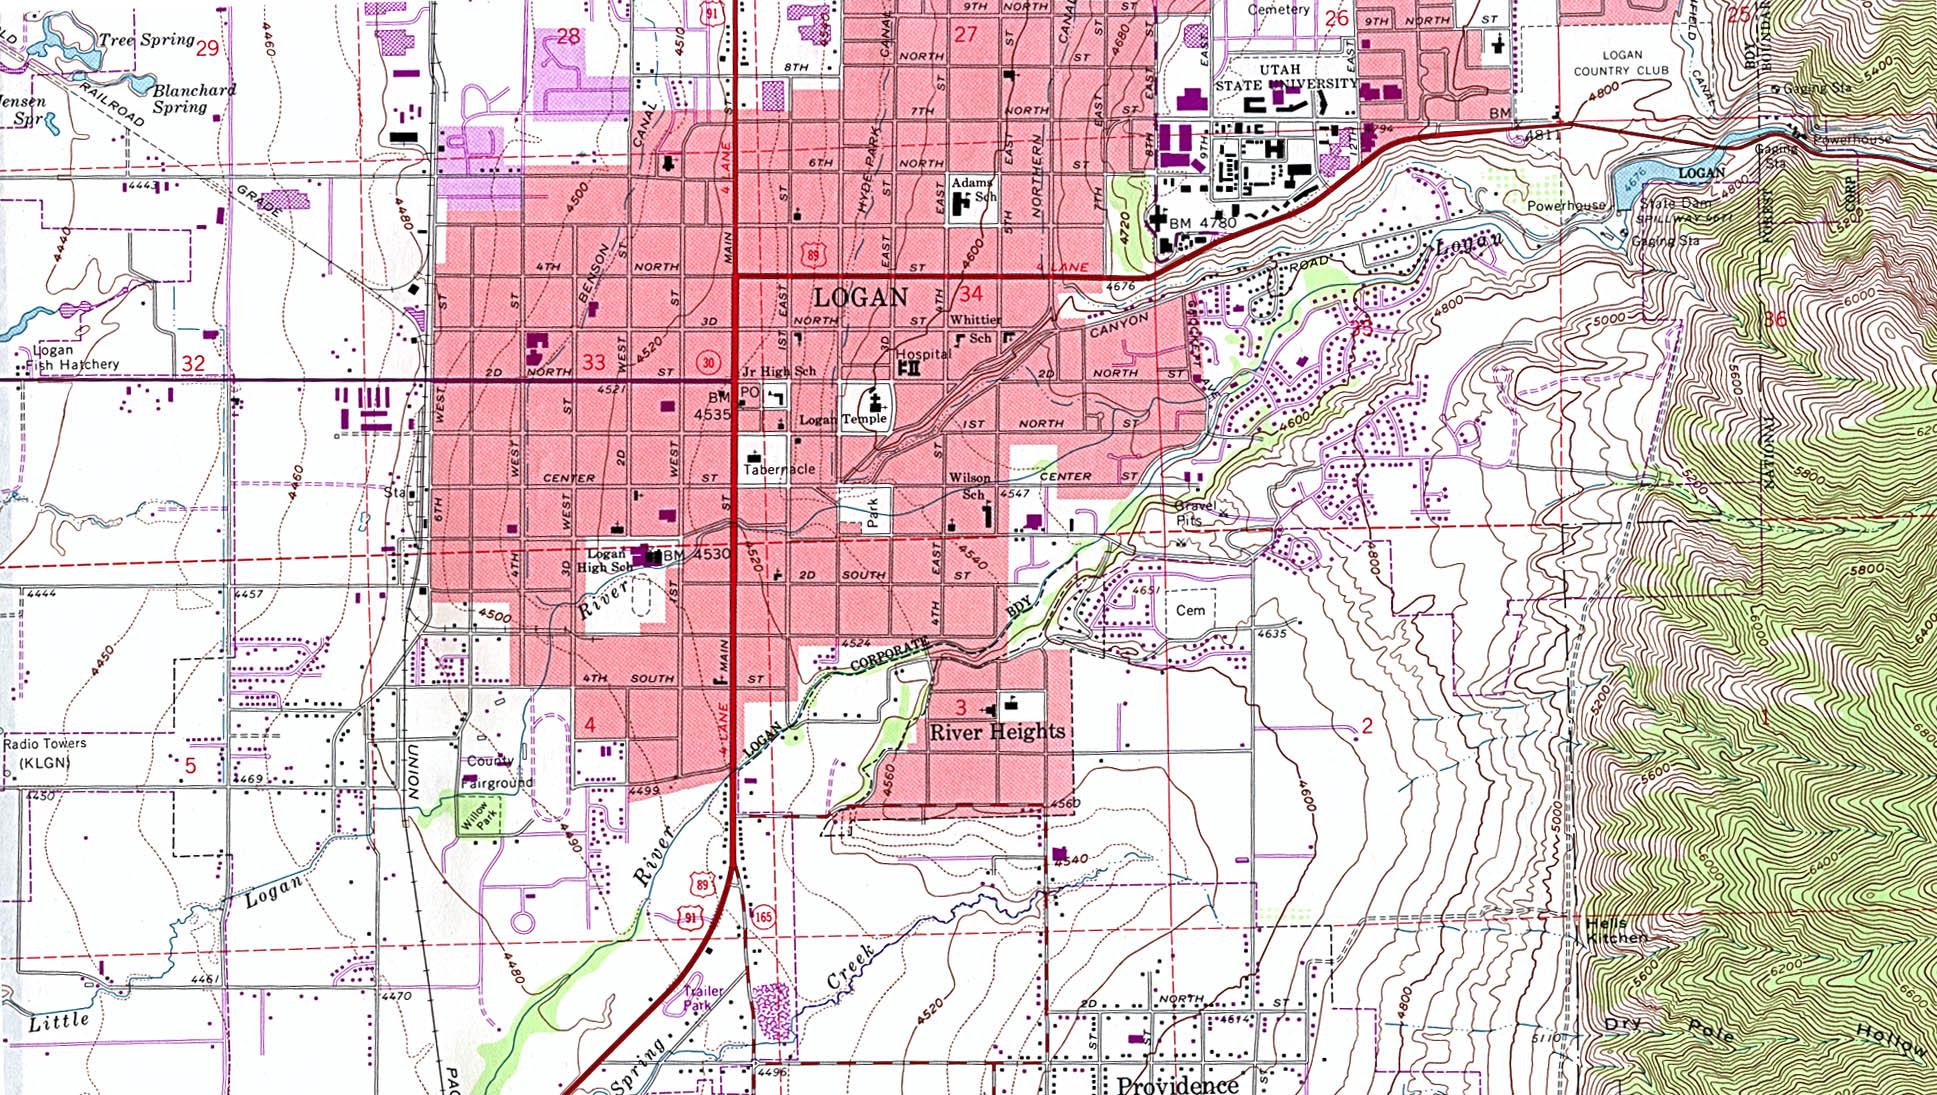 Utah Maps Map Collection UT - Topographic map of utah